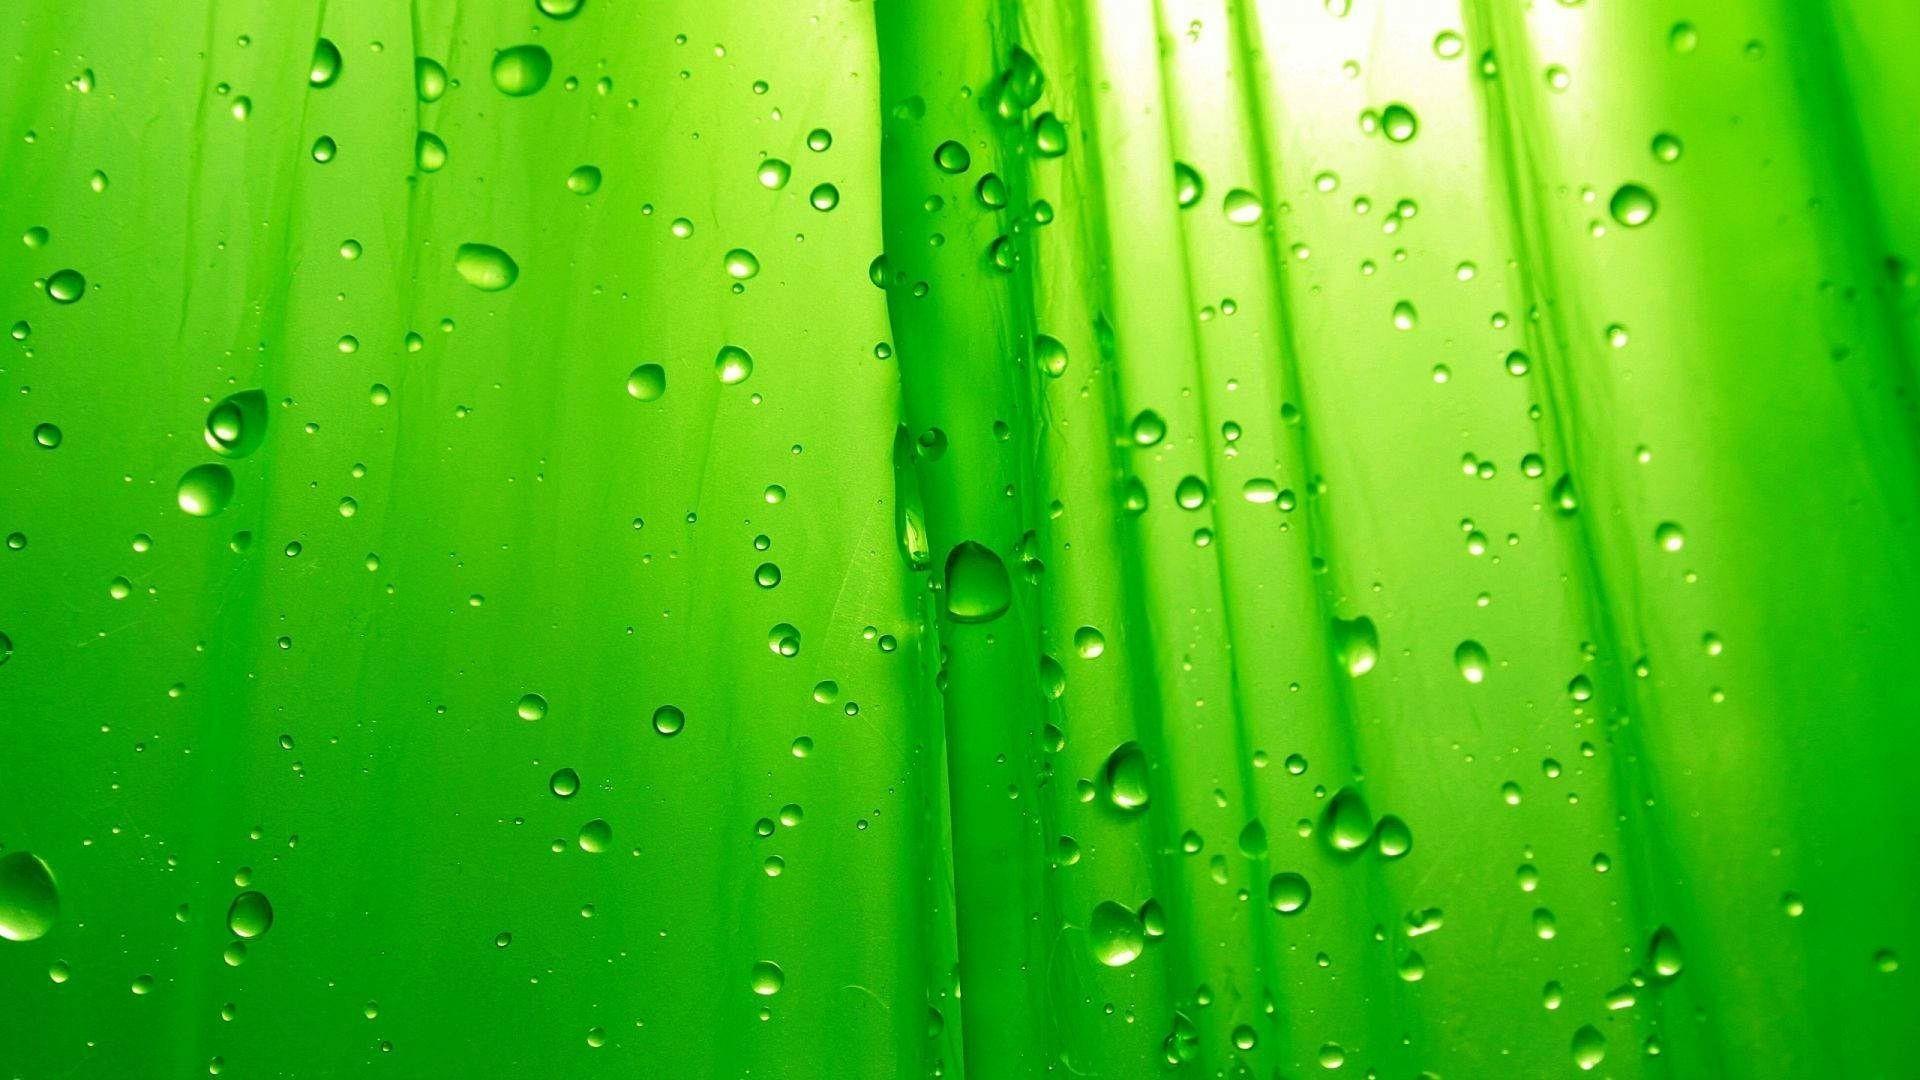 Cool Green Backgrounds – wallpaper.